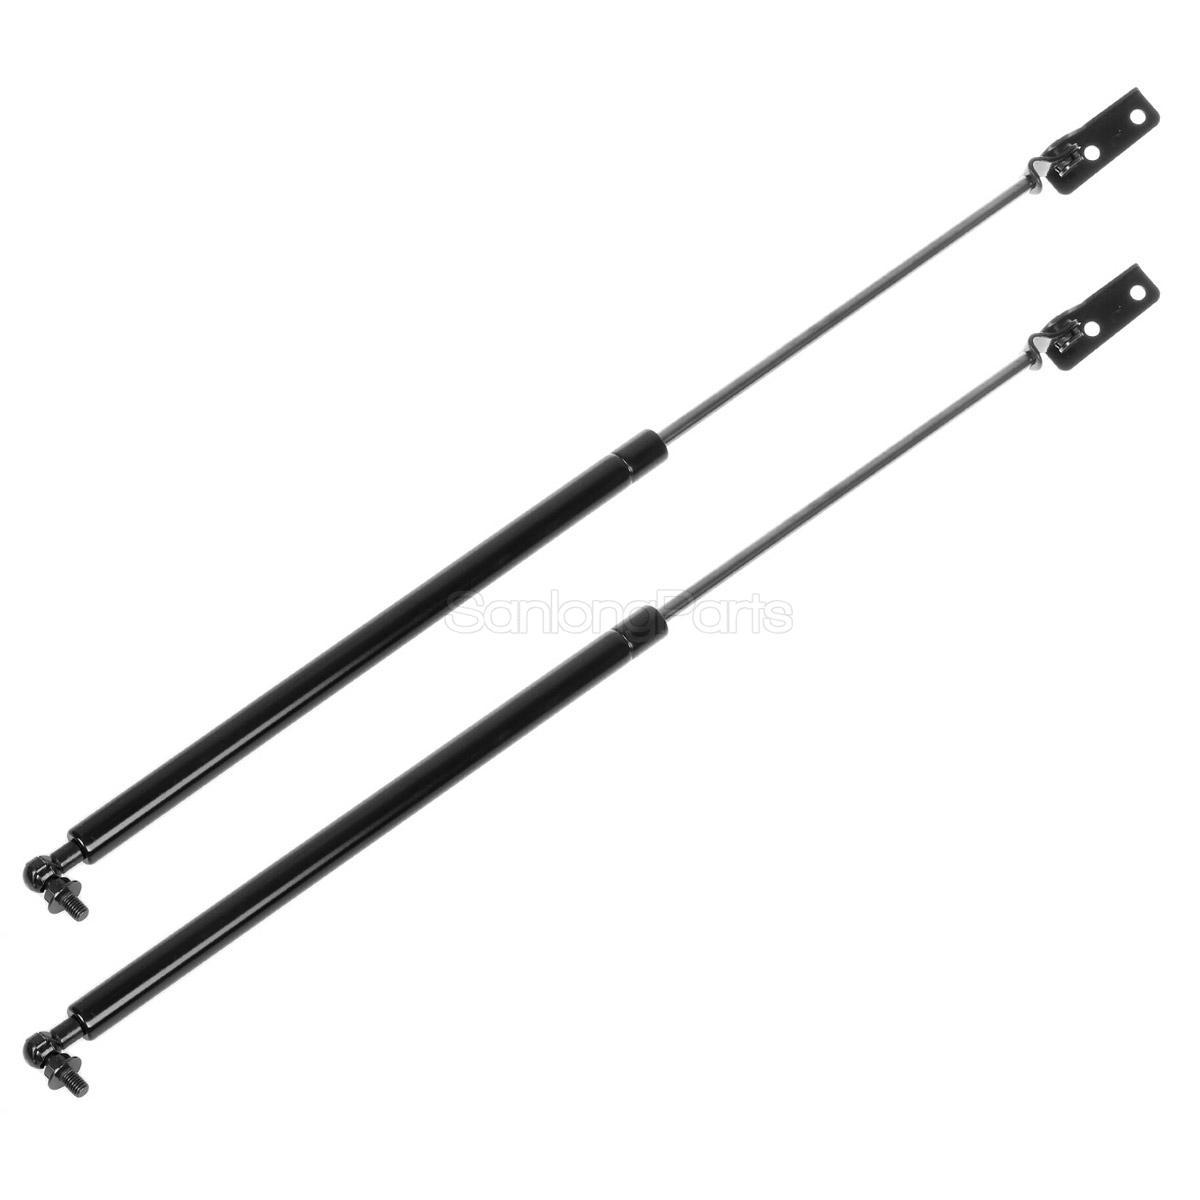 1pair Rear Hatch Lift Supports Shocks Struts Fits 1994: 1Pair 8195465 Rear Hatch Tailgate Lift Support Shock Strut